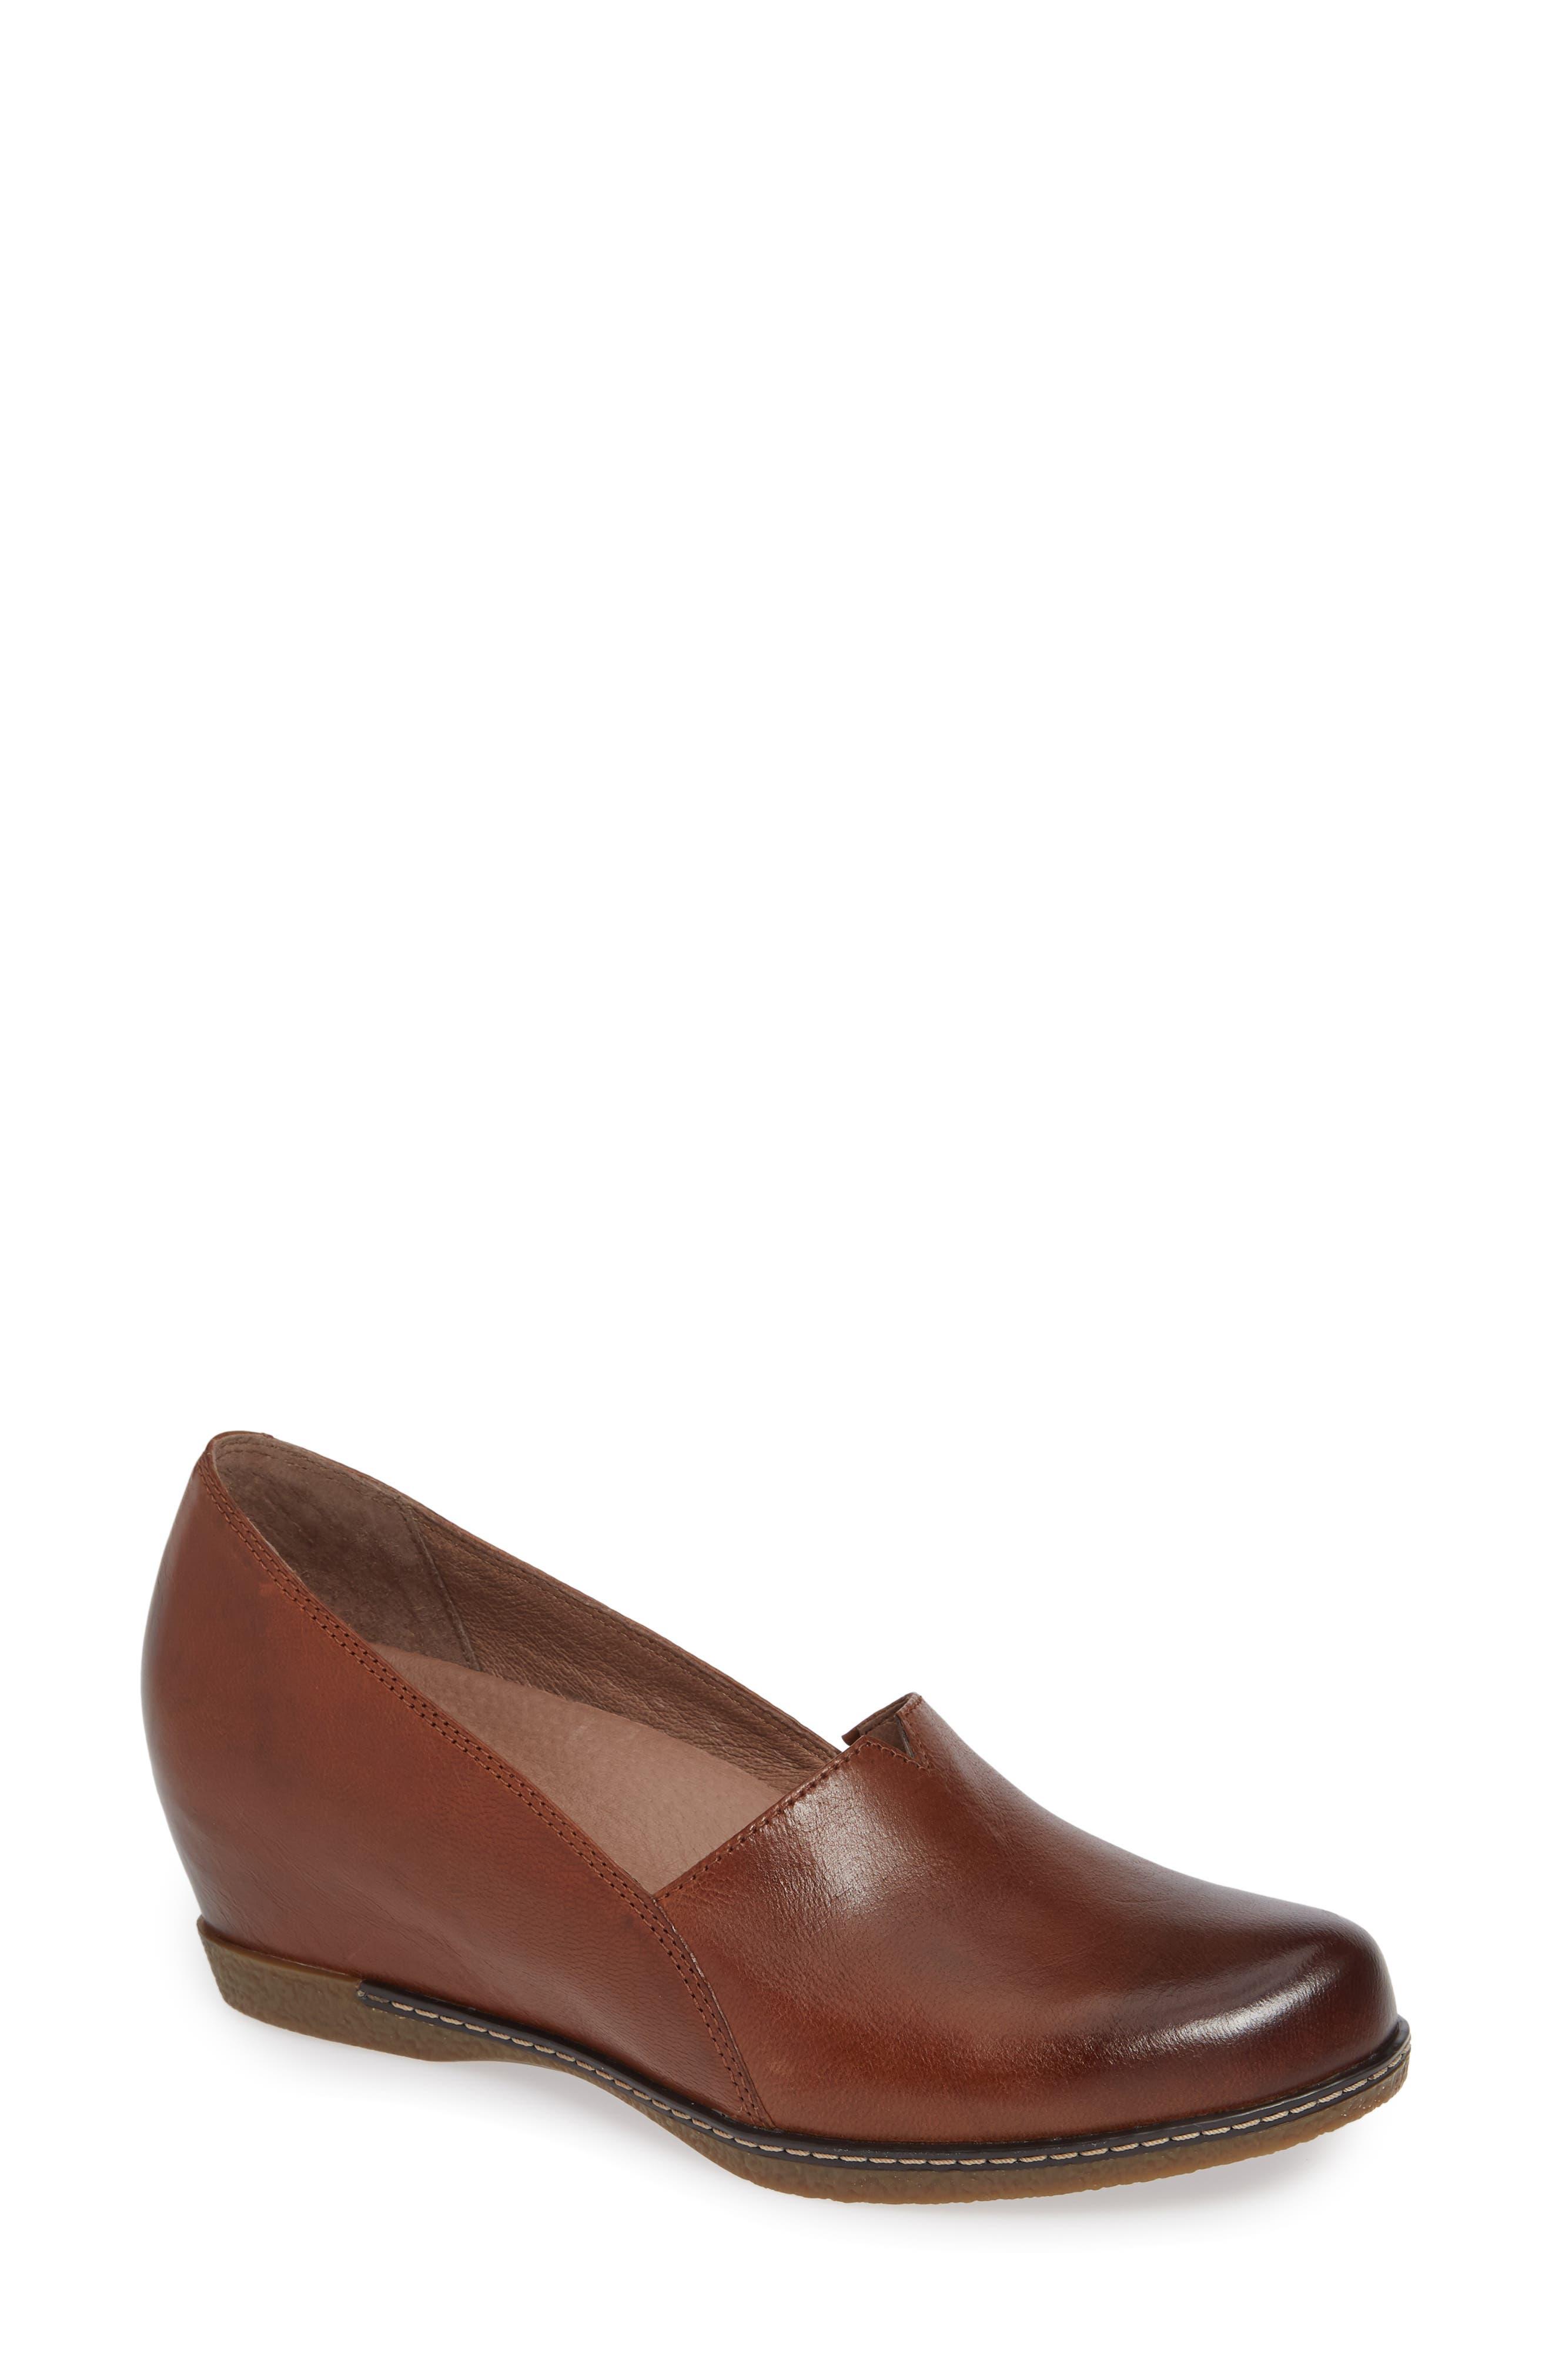 Liliana Concealed Wedge Slip-On,                         Main,                         color, Chestnut Burnished Leather